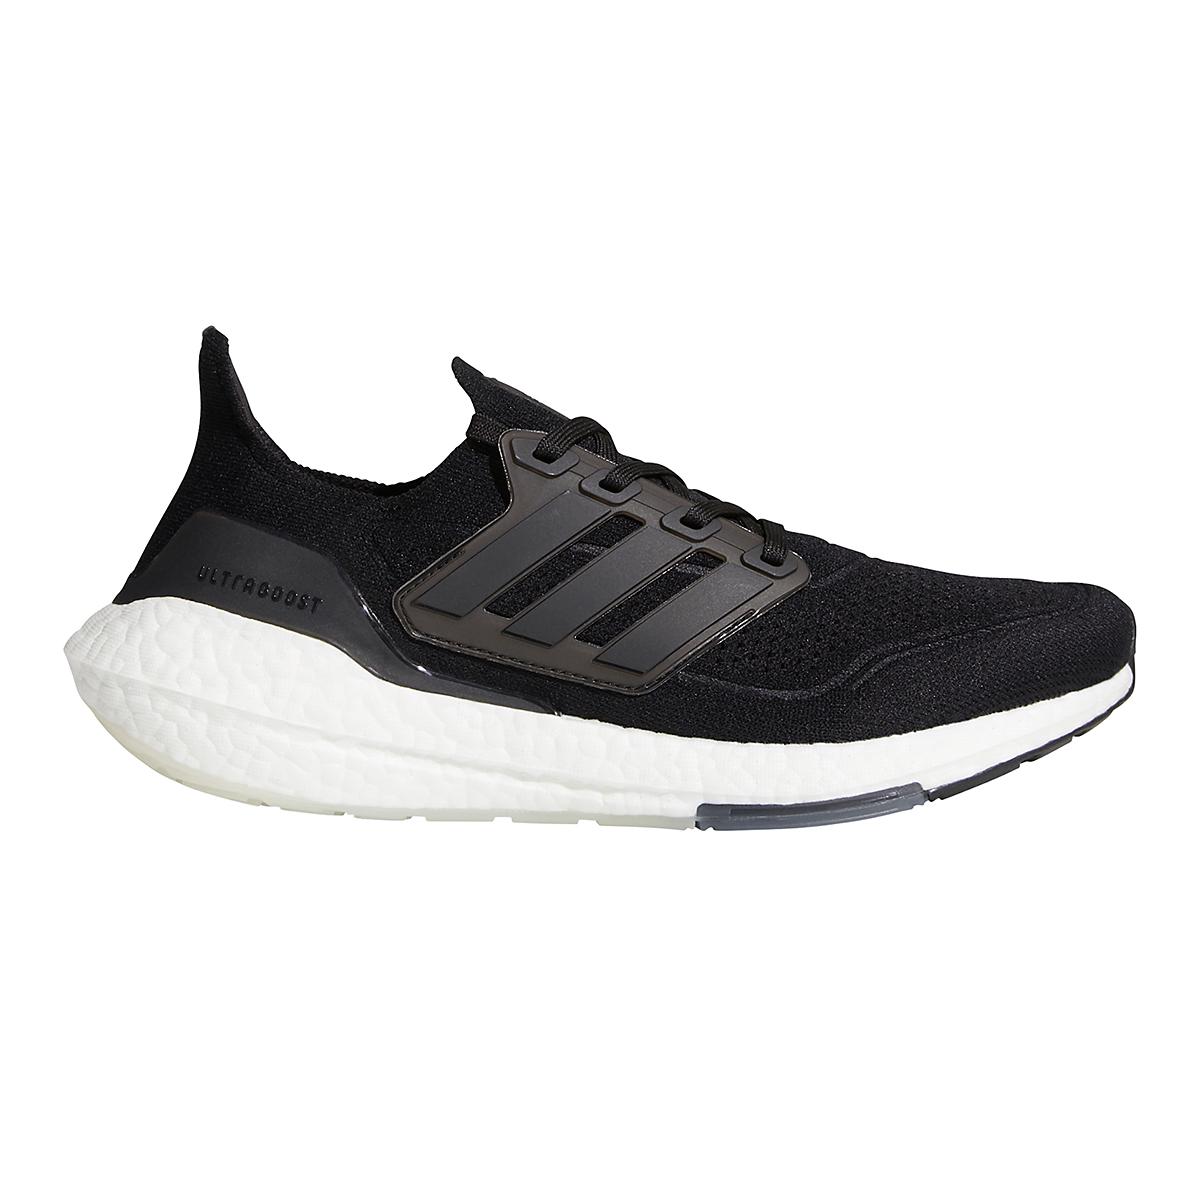 Men's Adidas Ultraboost 21 Running Shoe - Color: Core Black/Grey - Size: 6 - Width: Regular, Core Black/Grey, large, image 1